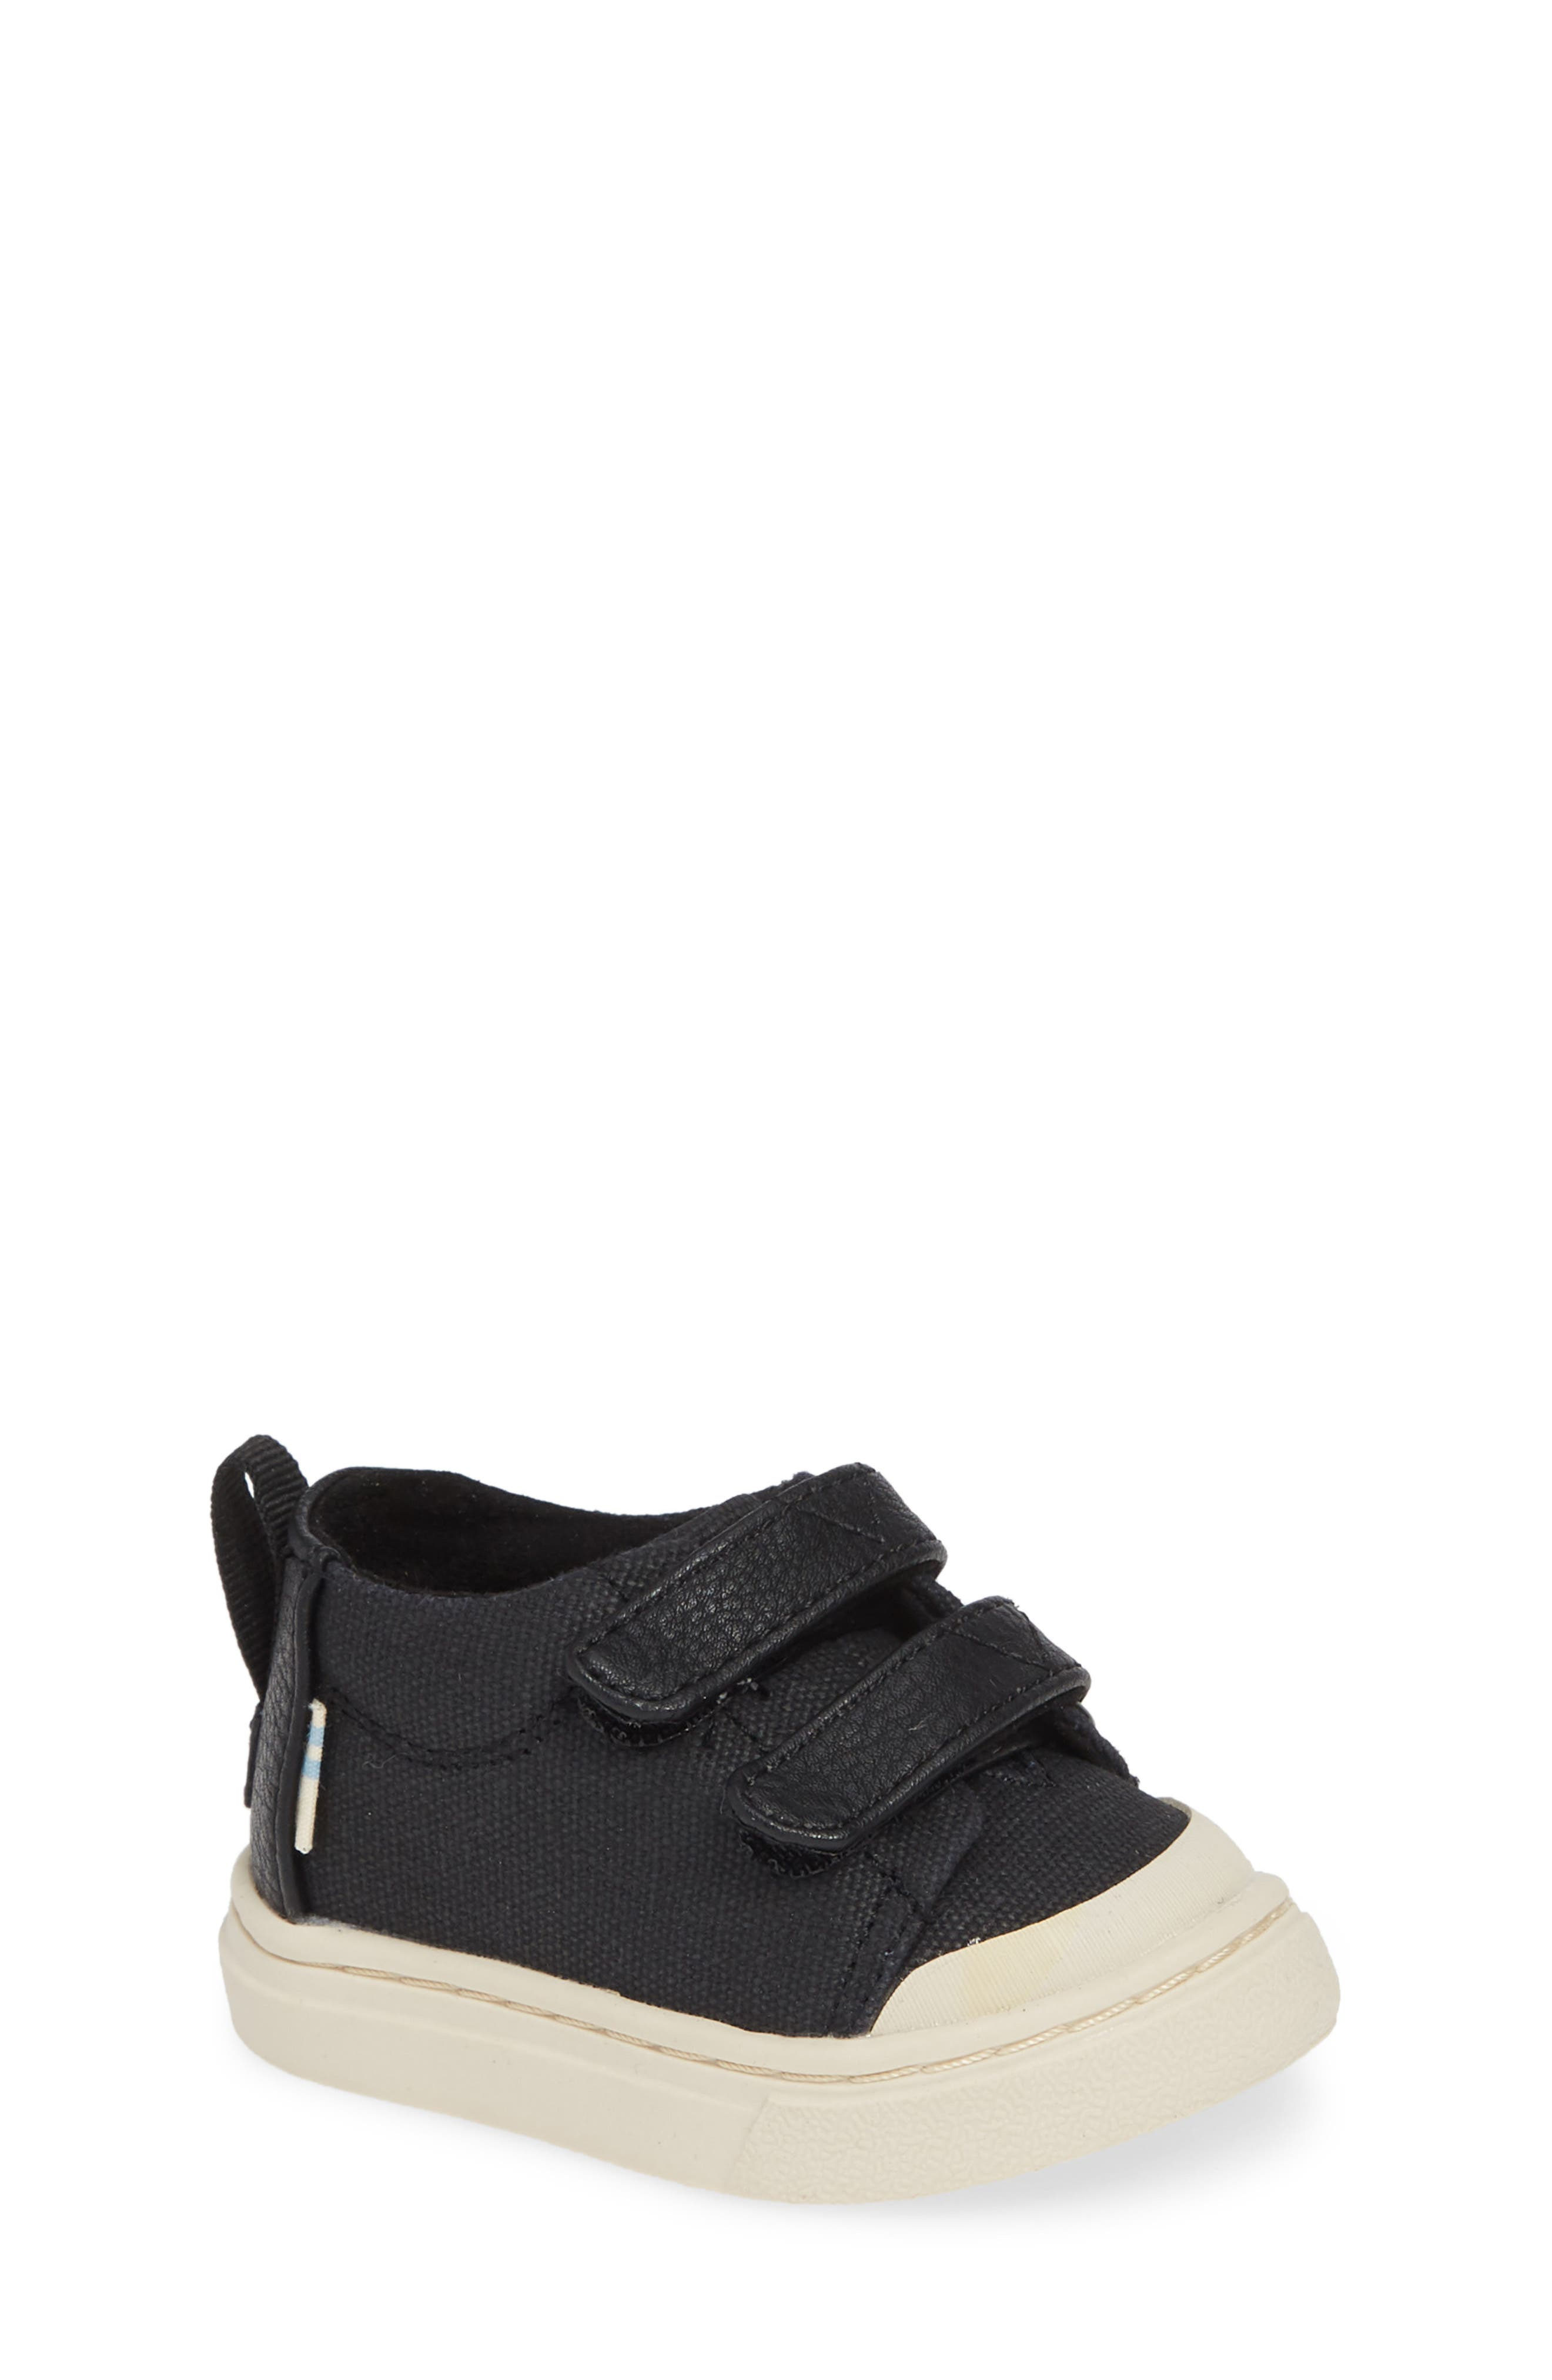 Lenny Mid Top Sneaker,                             Main thumbnail 1, color,                             BLACK TEXTURAL CANVAS